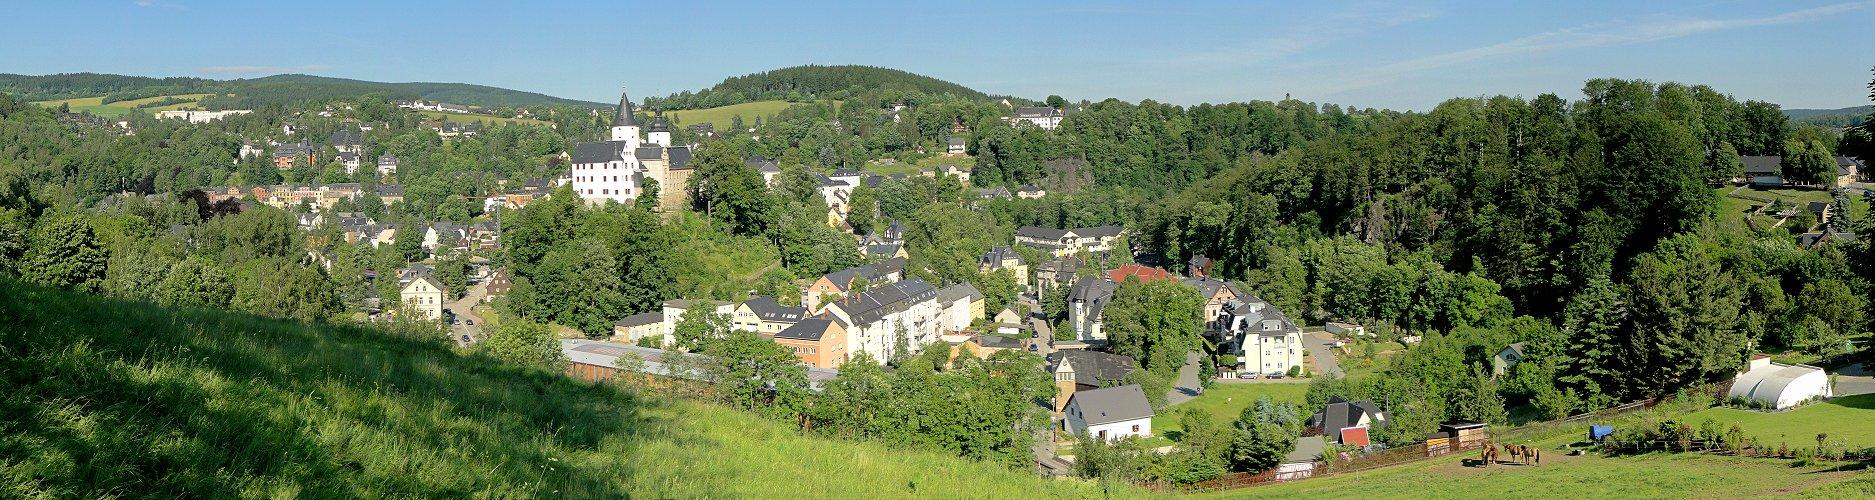 "Schwarzenberg - ""Perle des Erzgebirges"" II"